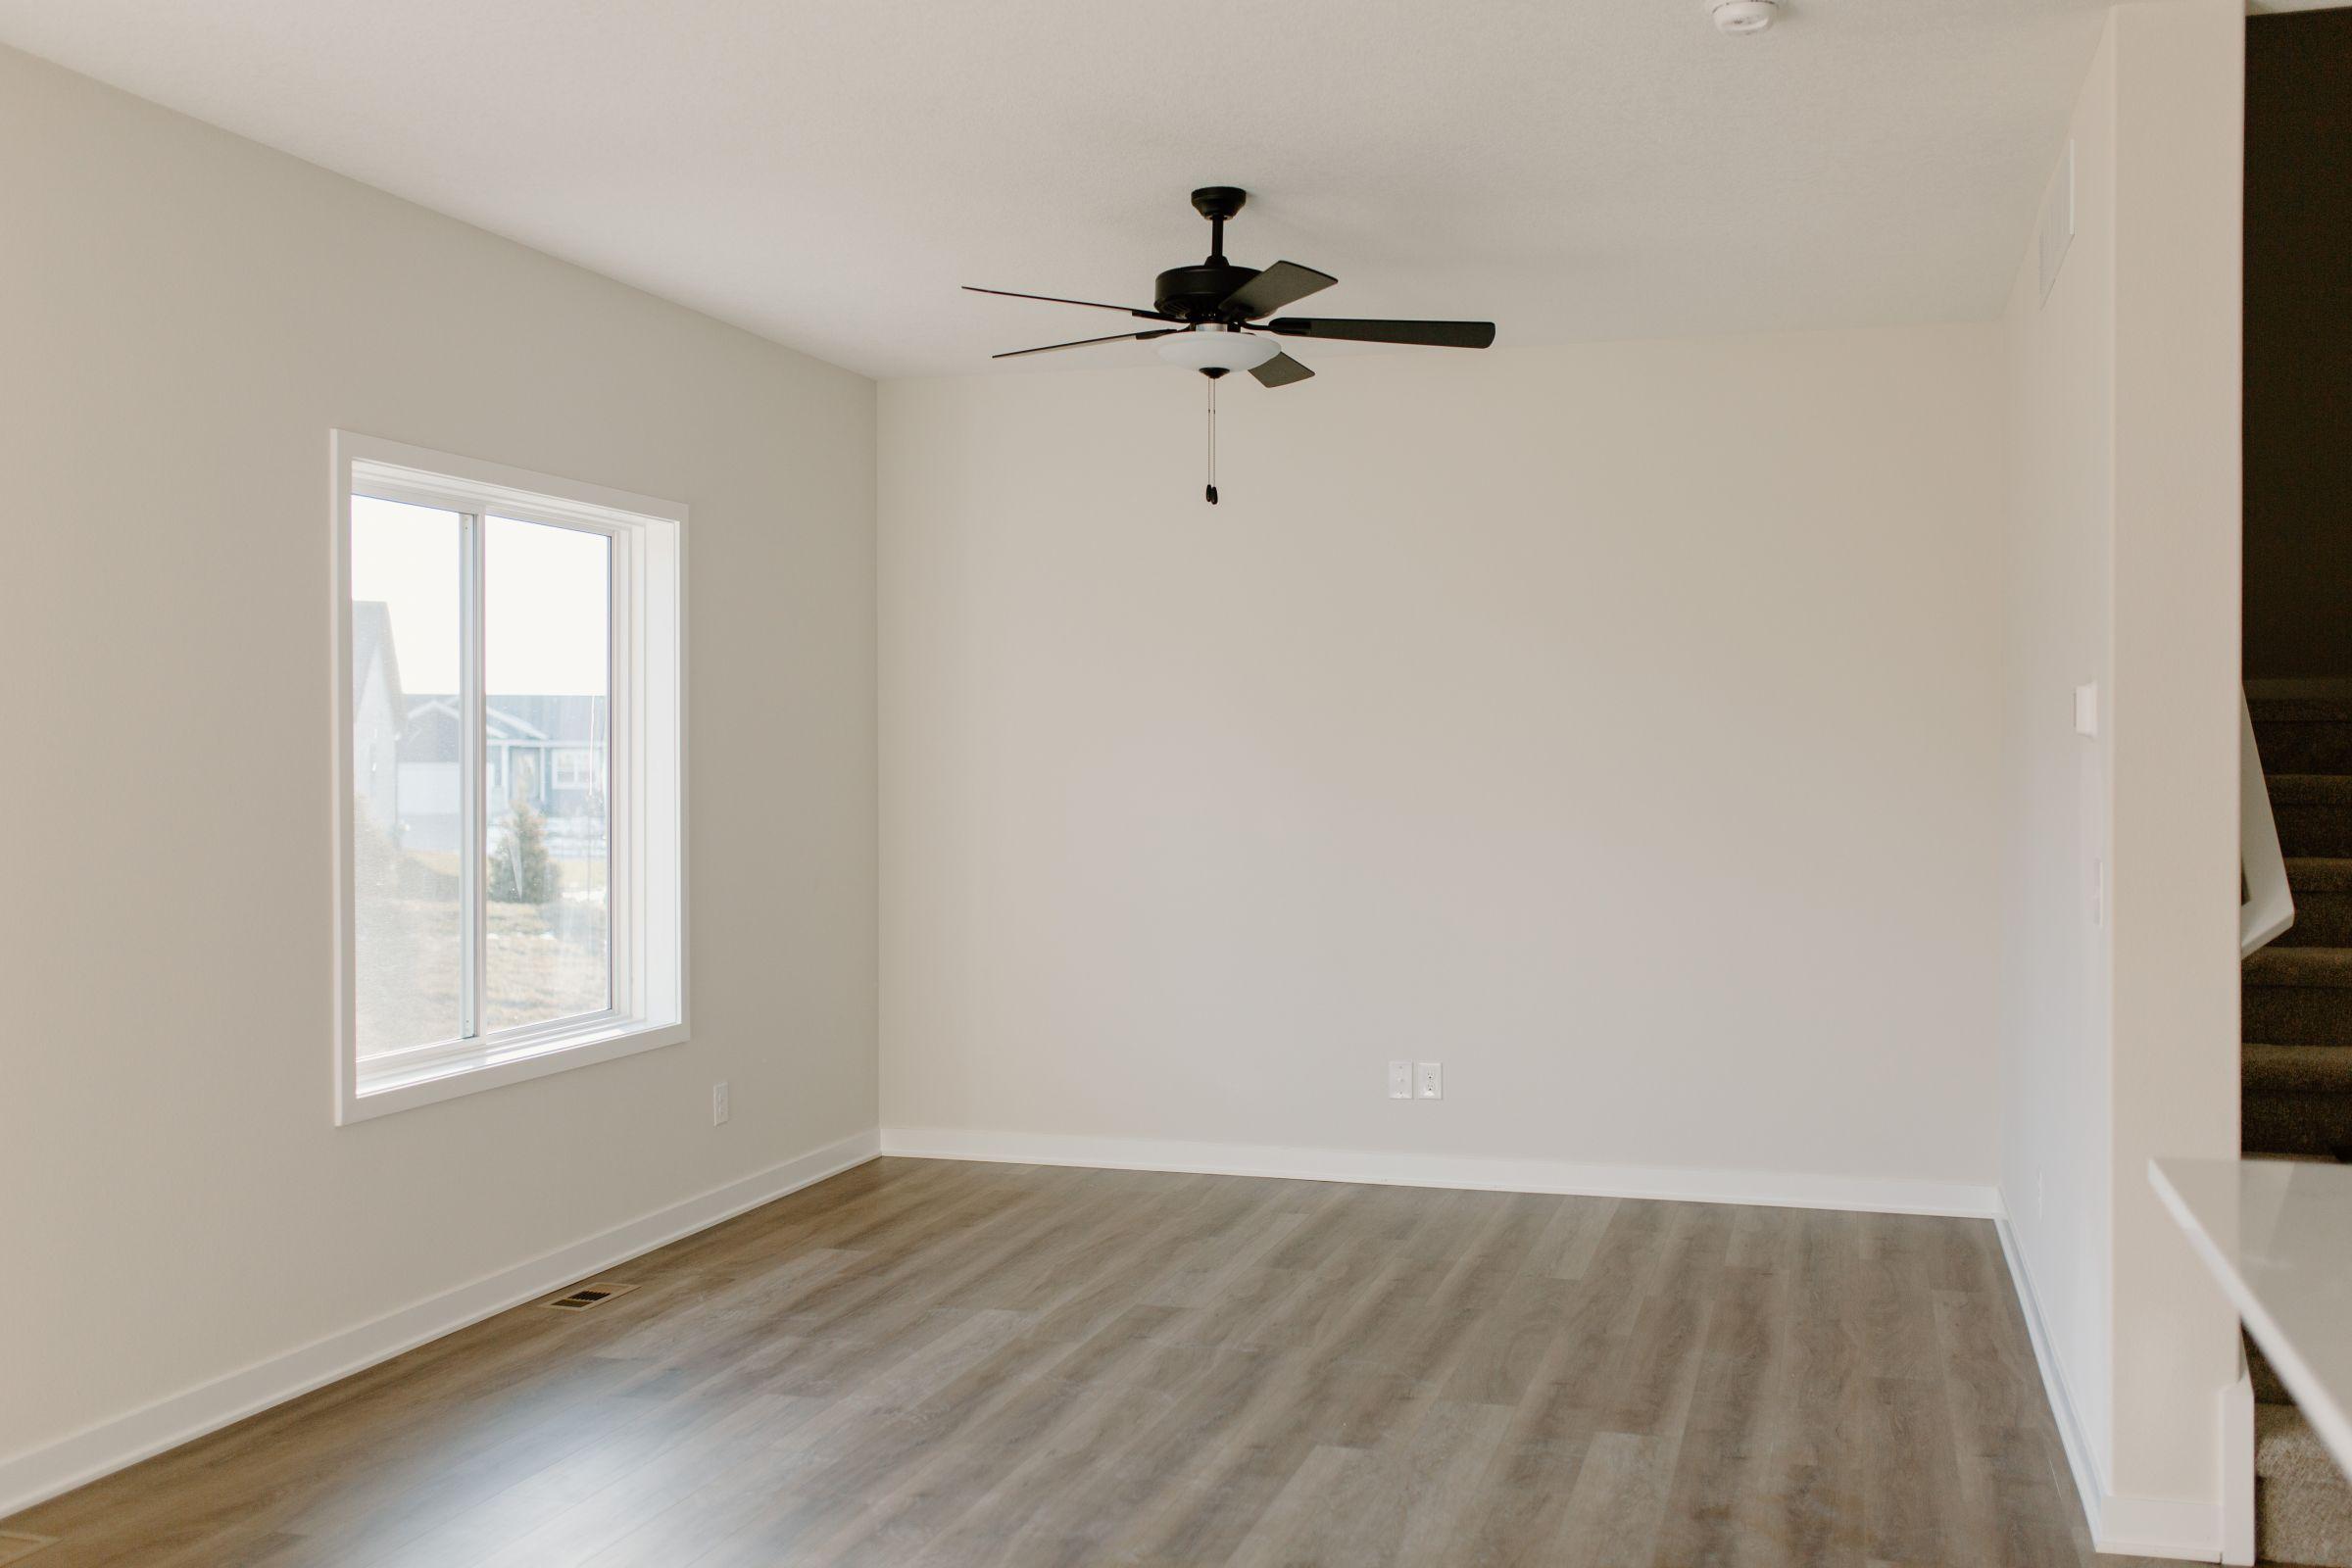 residential-warren-county-iowa-0-acres-listing-number-15366-5-2021-02-18-165317.jpg